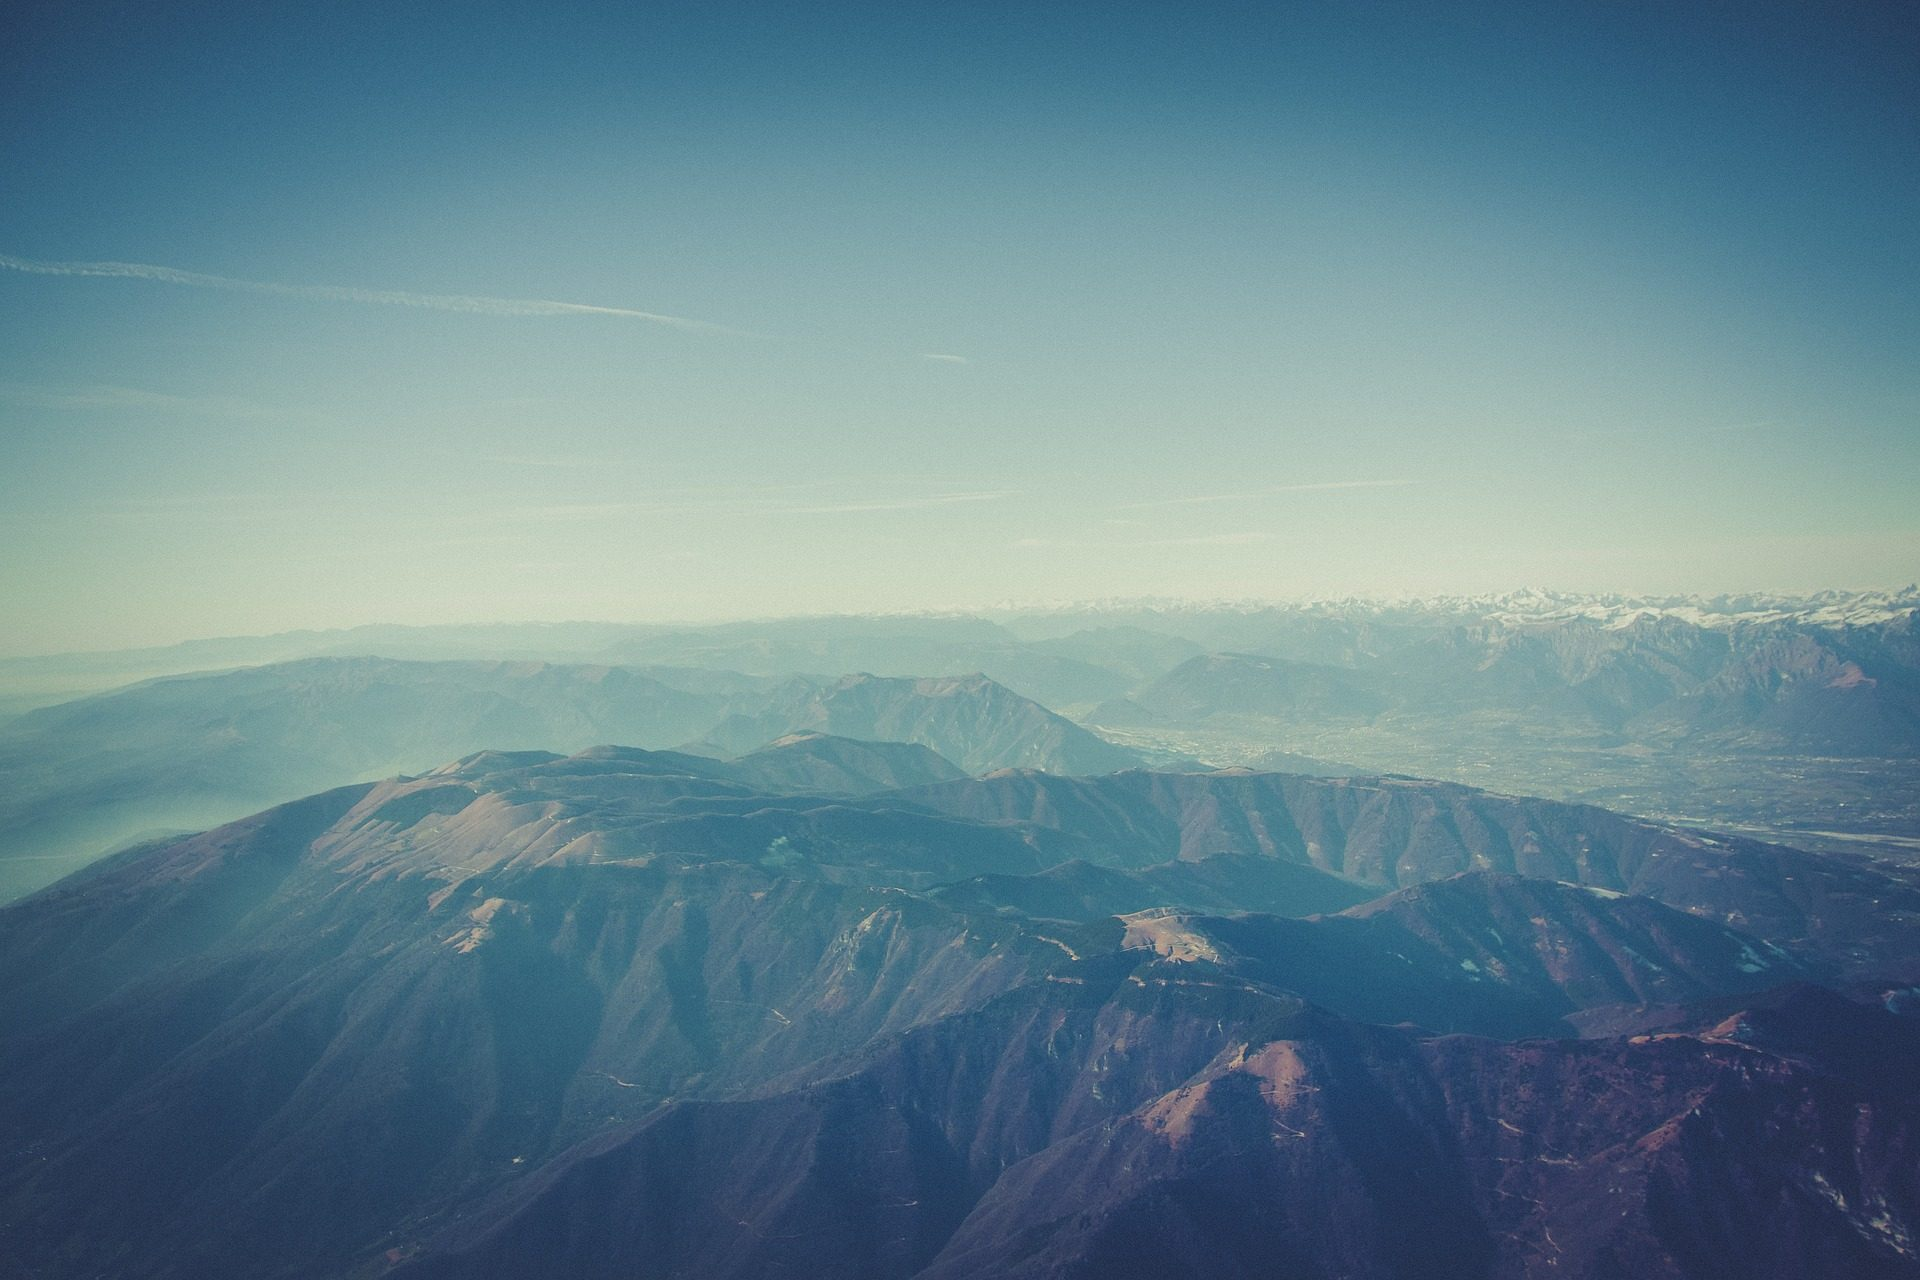 Montañas, पिज्जा, बार देखे गए, क्षितिज, दूरी, ऊंचाई, cordillera - HD वॉलपेपर - प्रोफेसर-falken.com